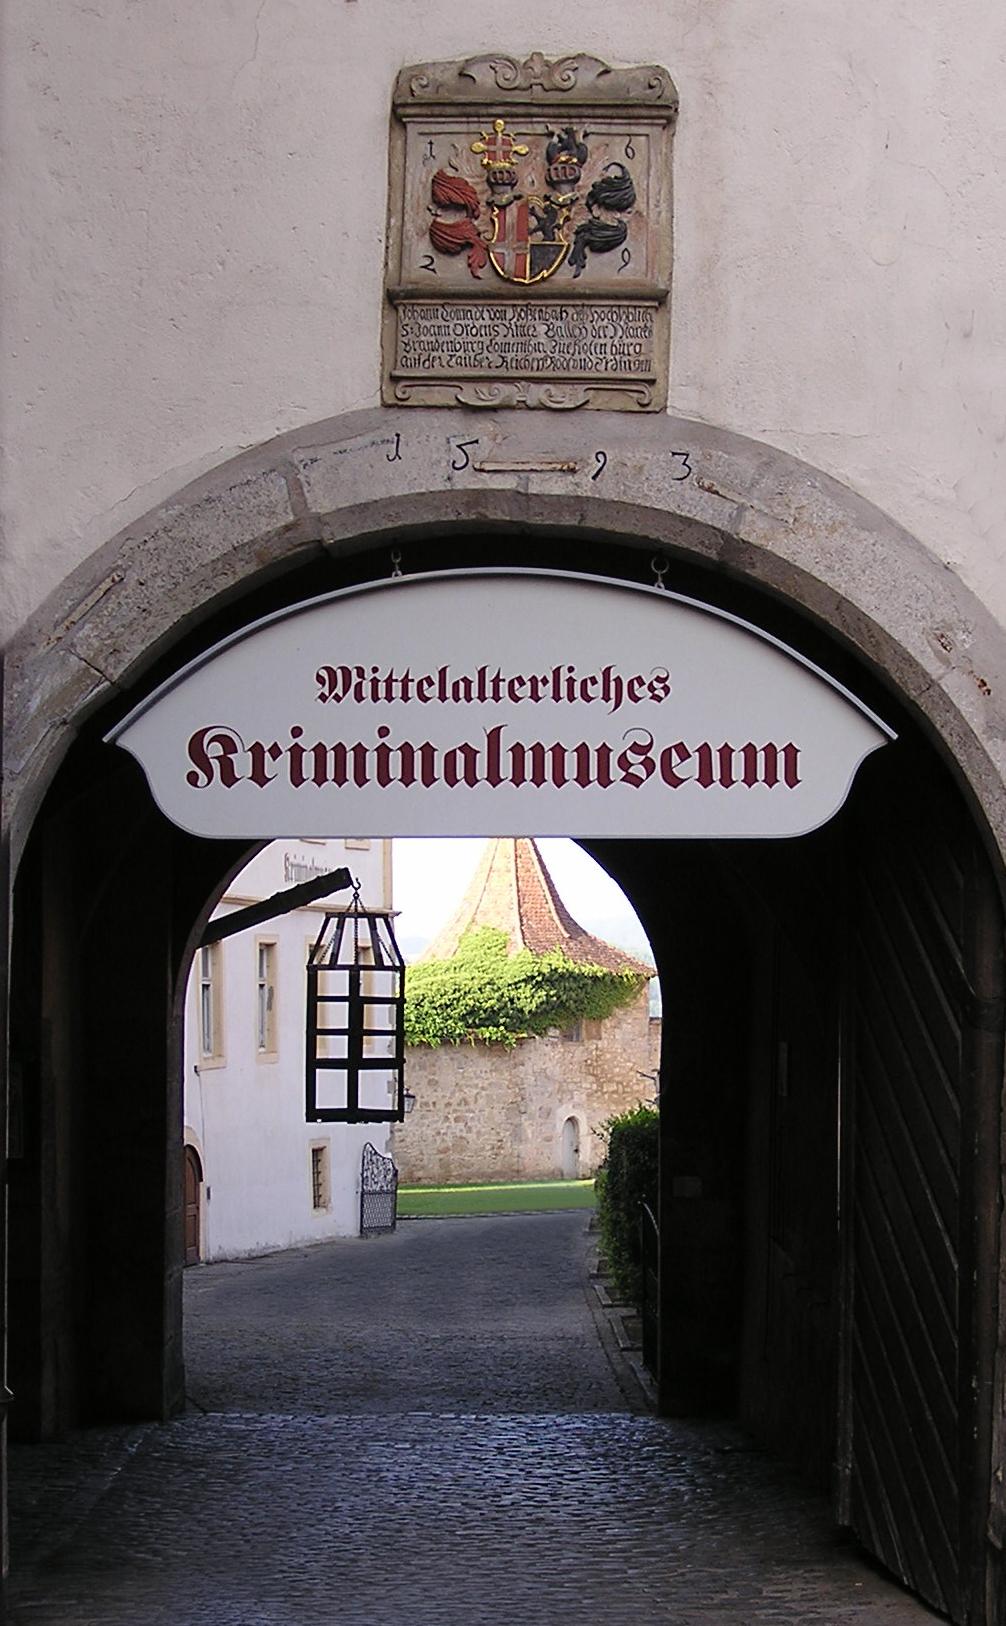 Kriminalmuseum - Arrival